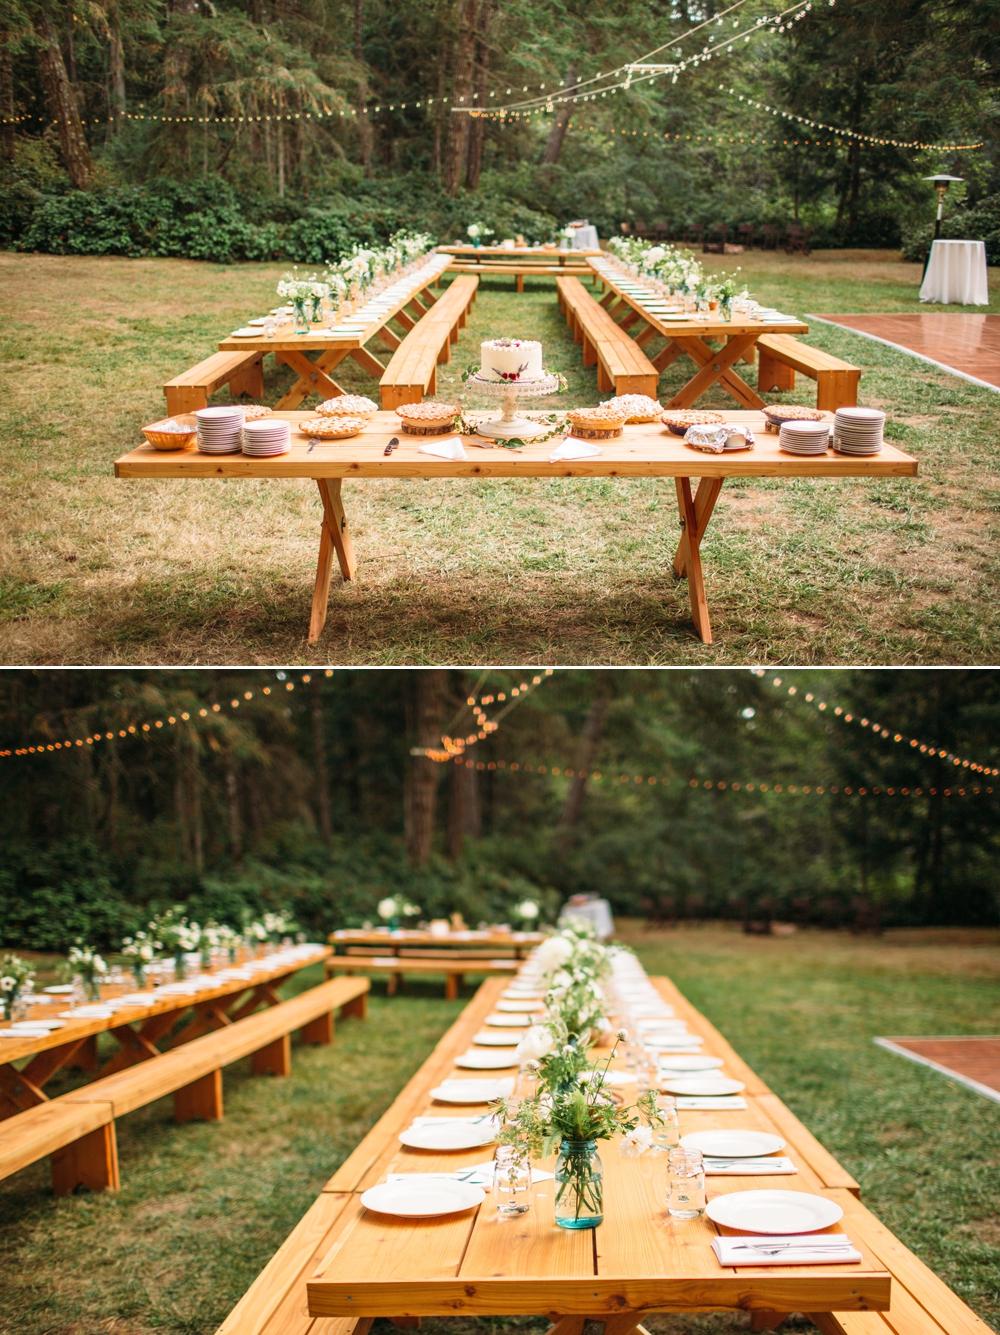 long-picnic-tables-wedding-reception-setup